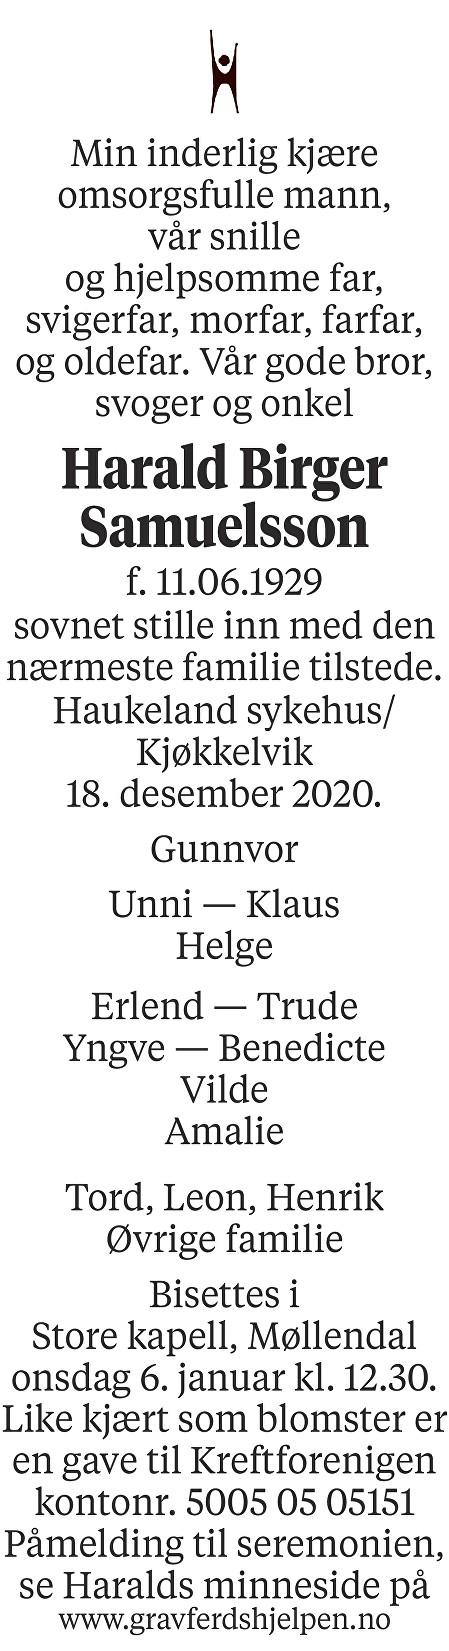 Harald Birger Samuelsson Dødsannonse